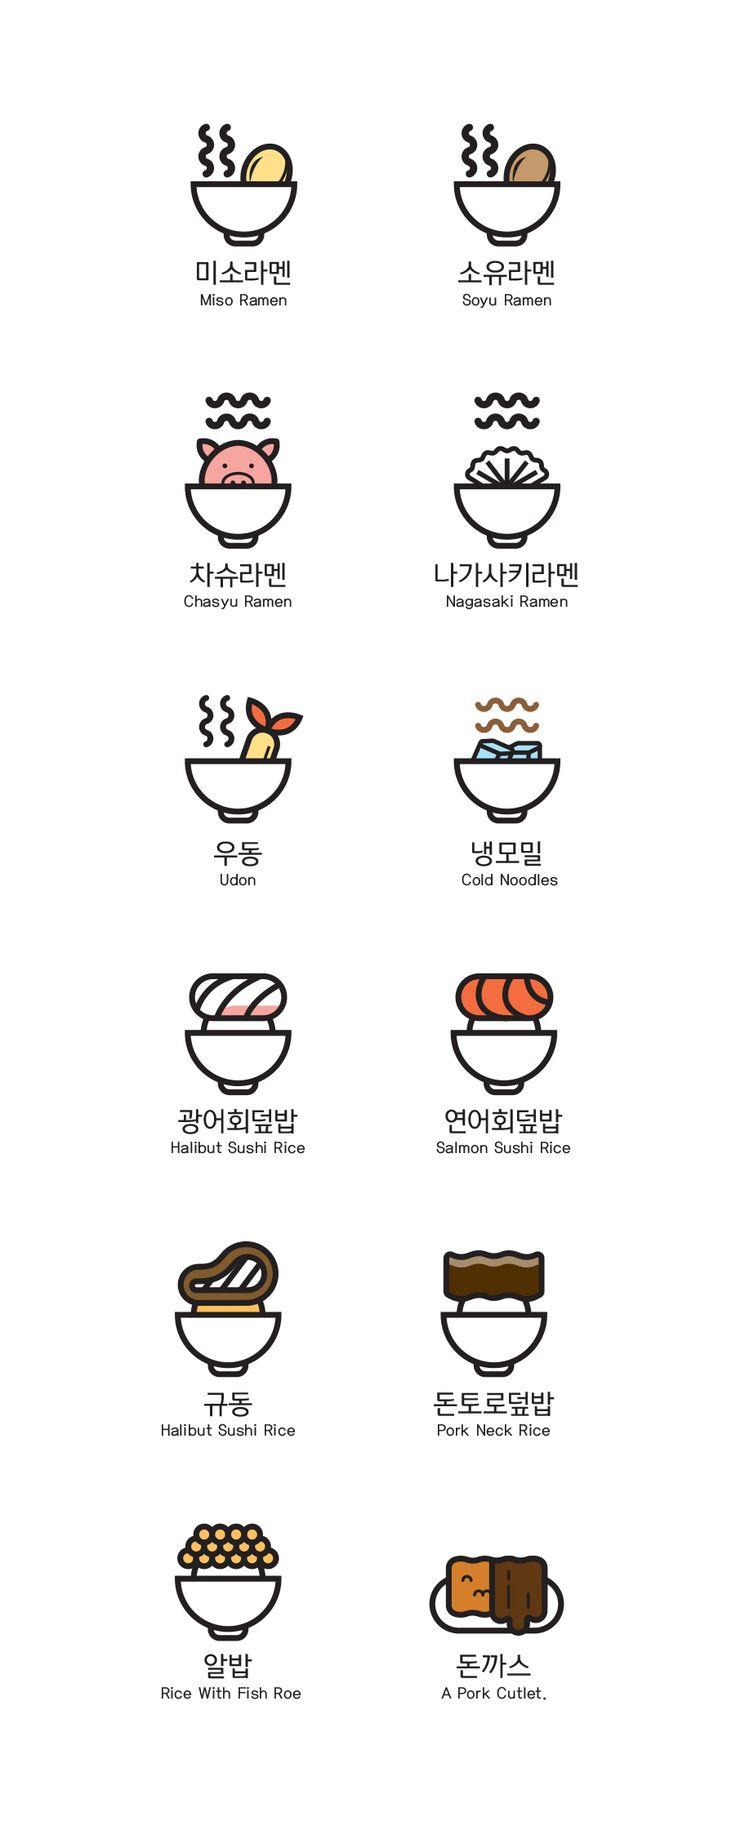 JAPAN FOOD (Ramen & Rice) 2017 on Behance